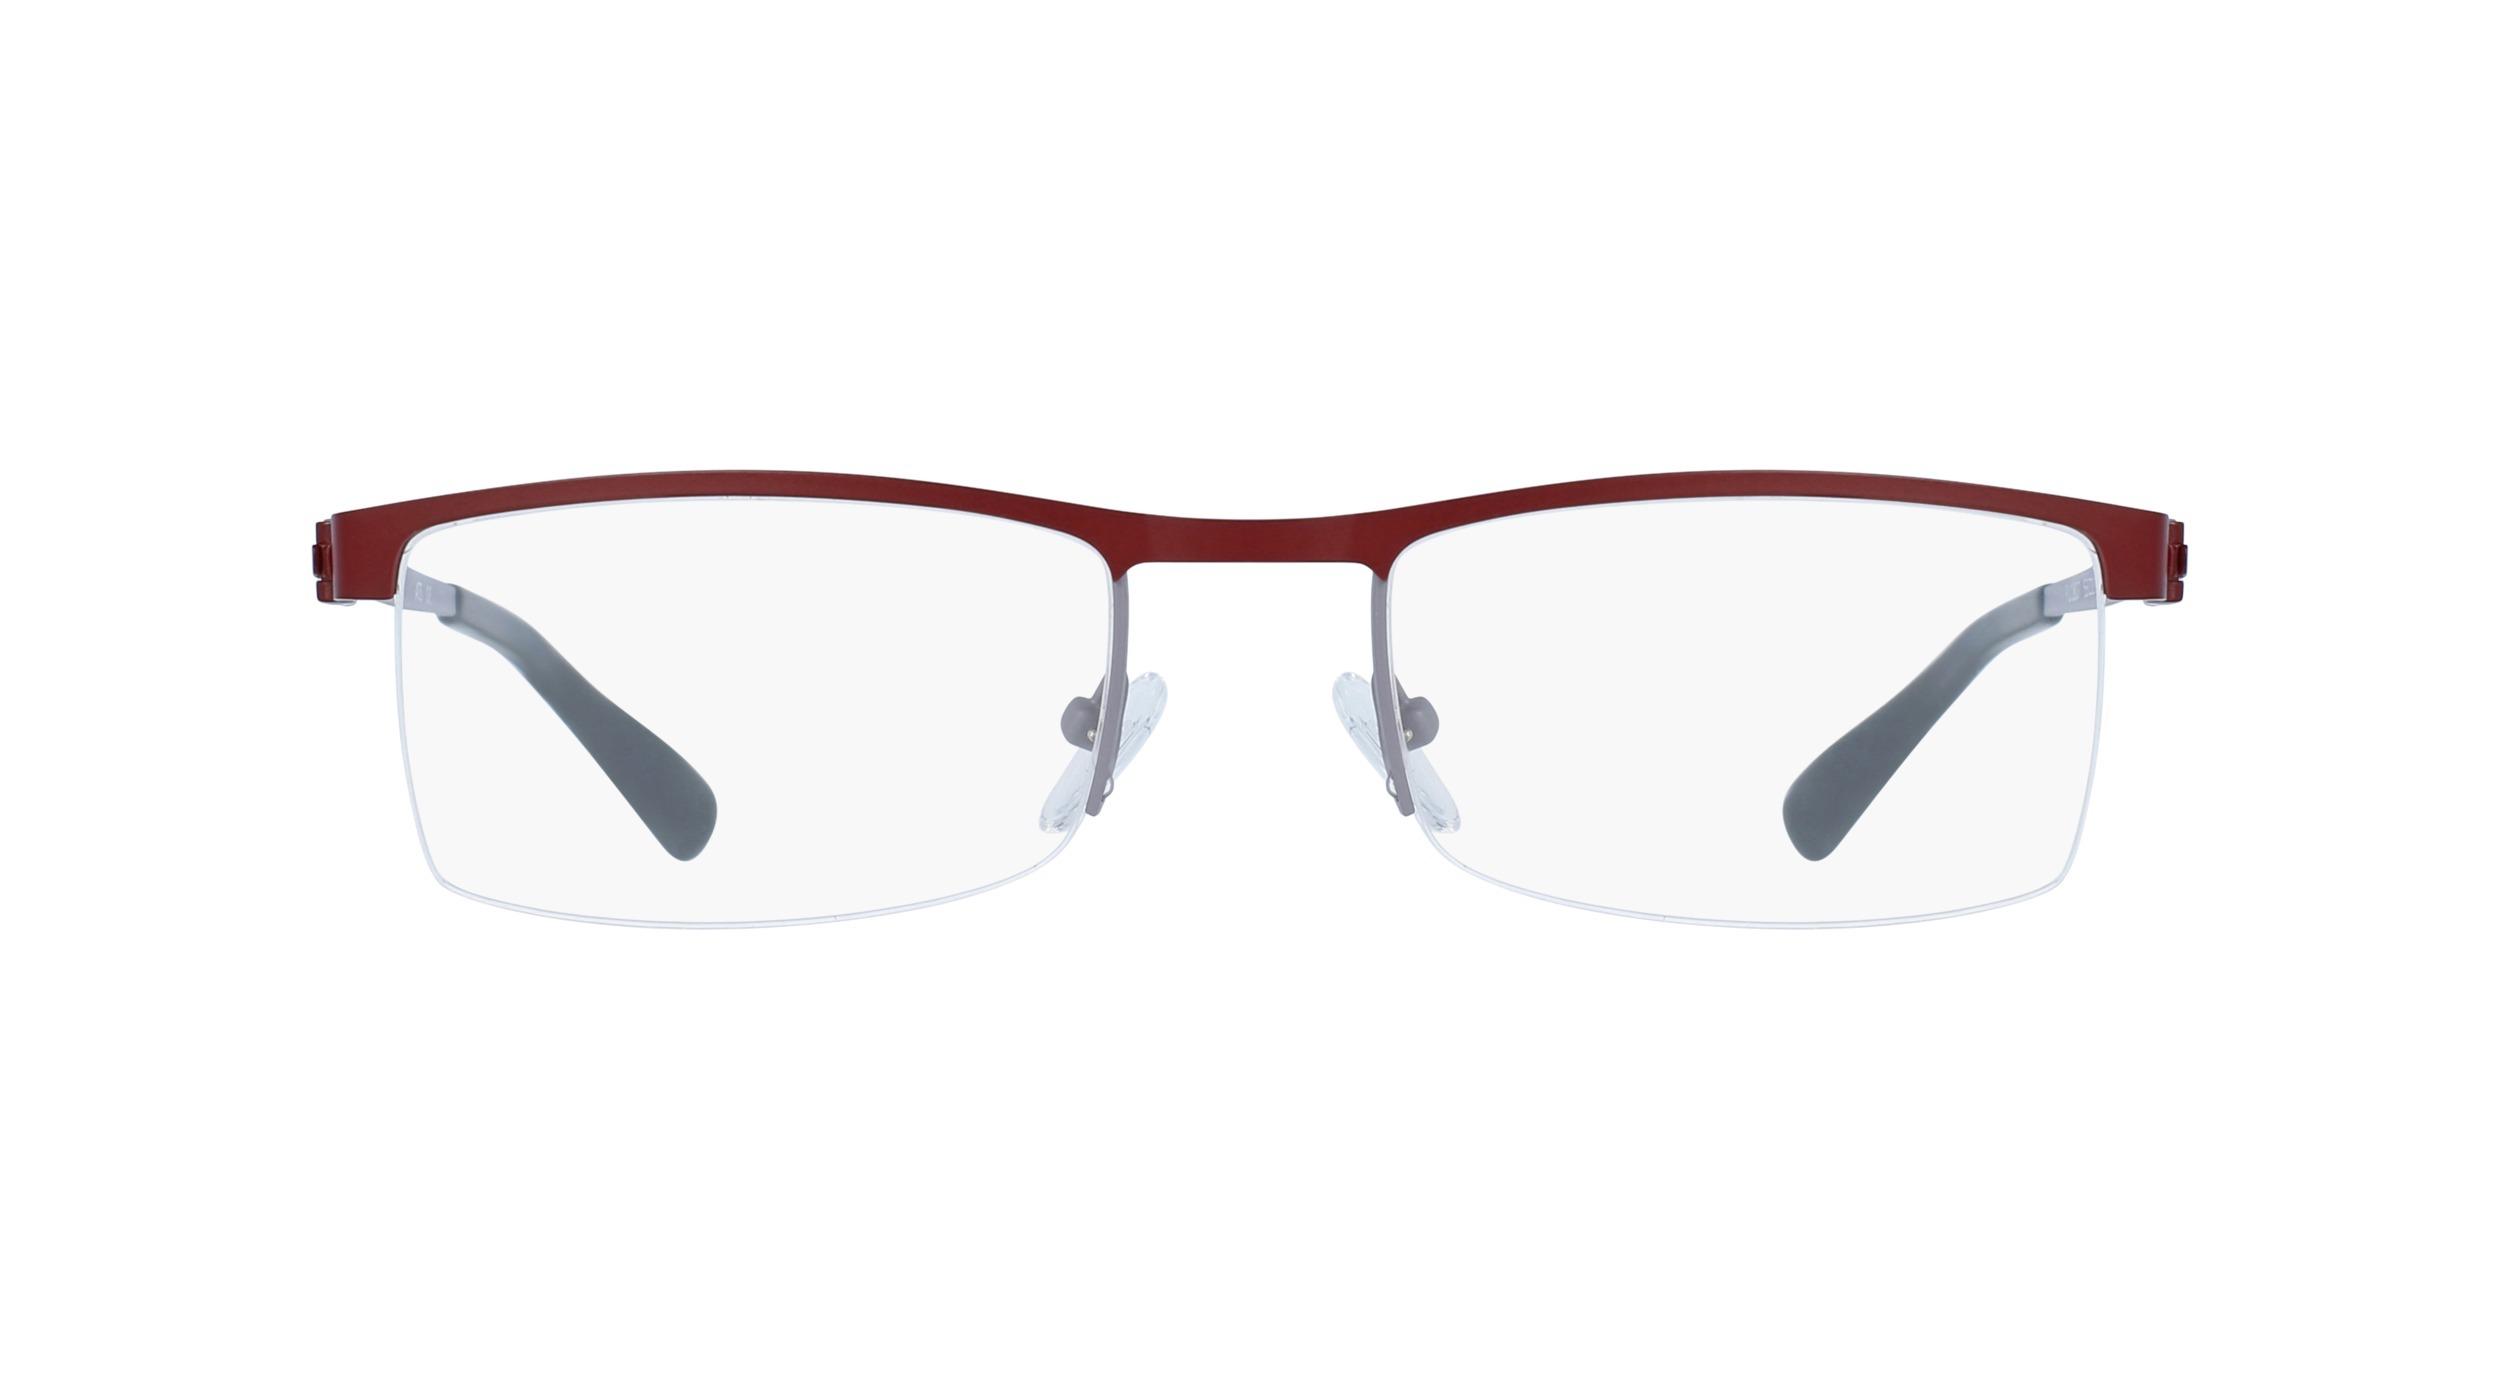 optic2000-lunettes-puredesign